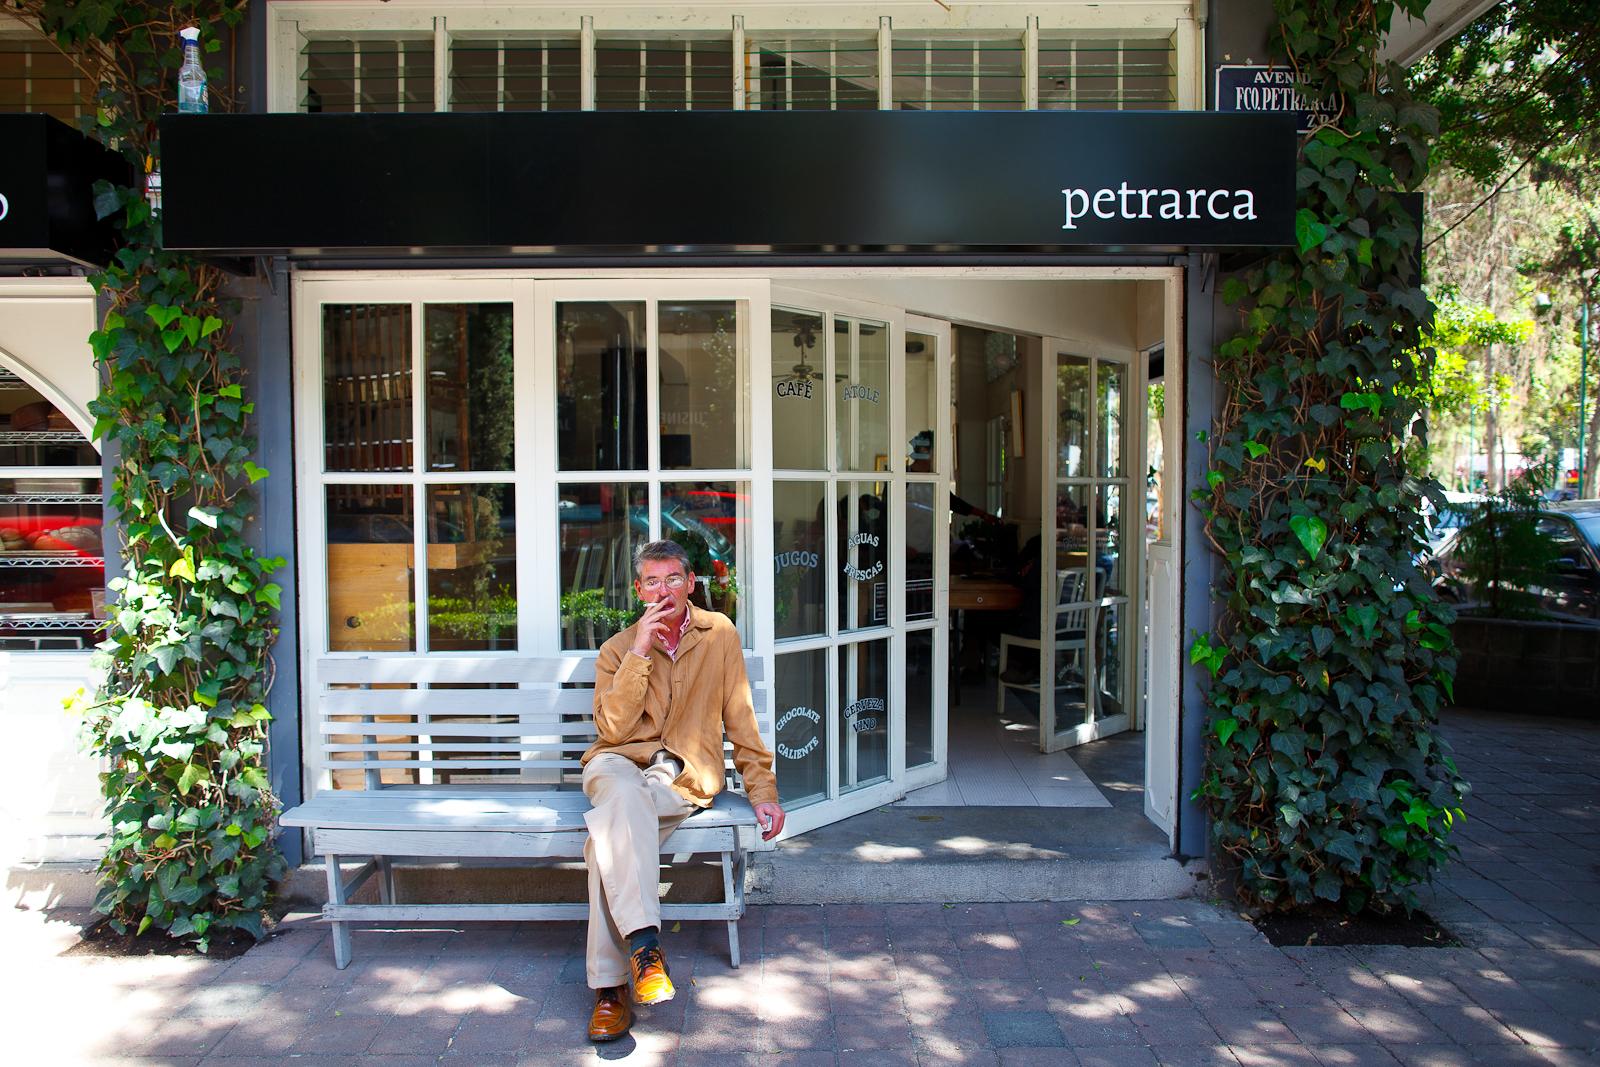 Eno Petrarca